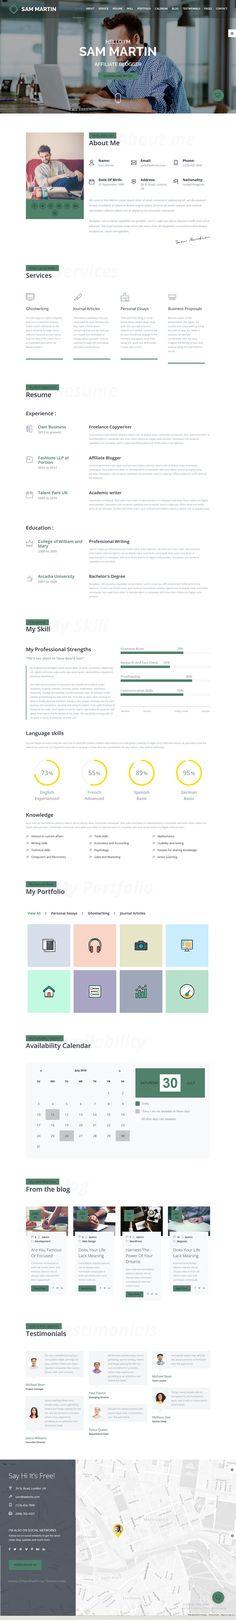 Sam Martin - Personal vCard Resume HTML Template - resume html template